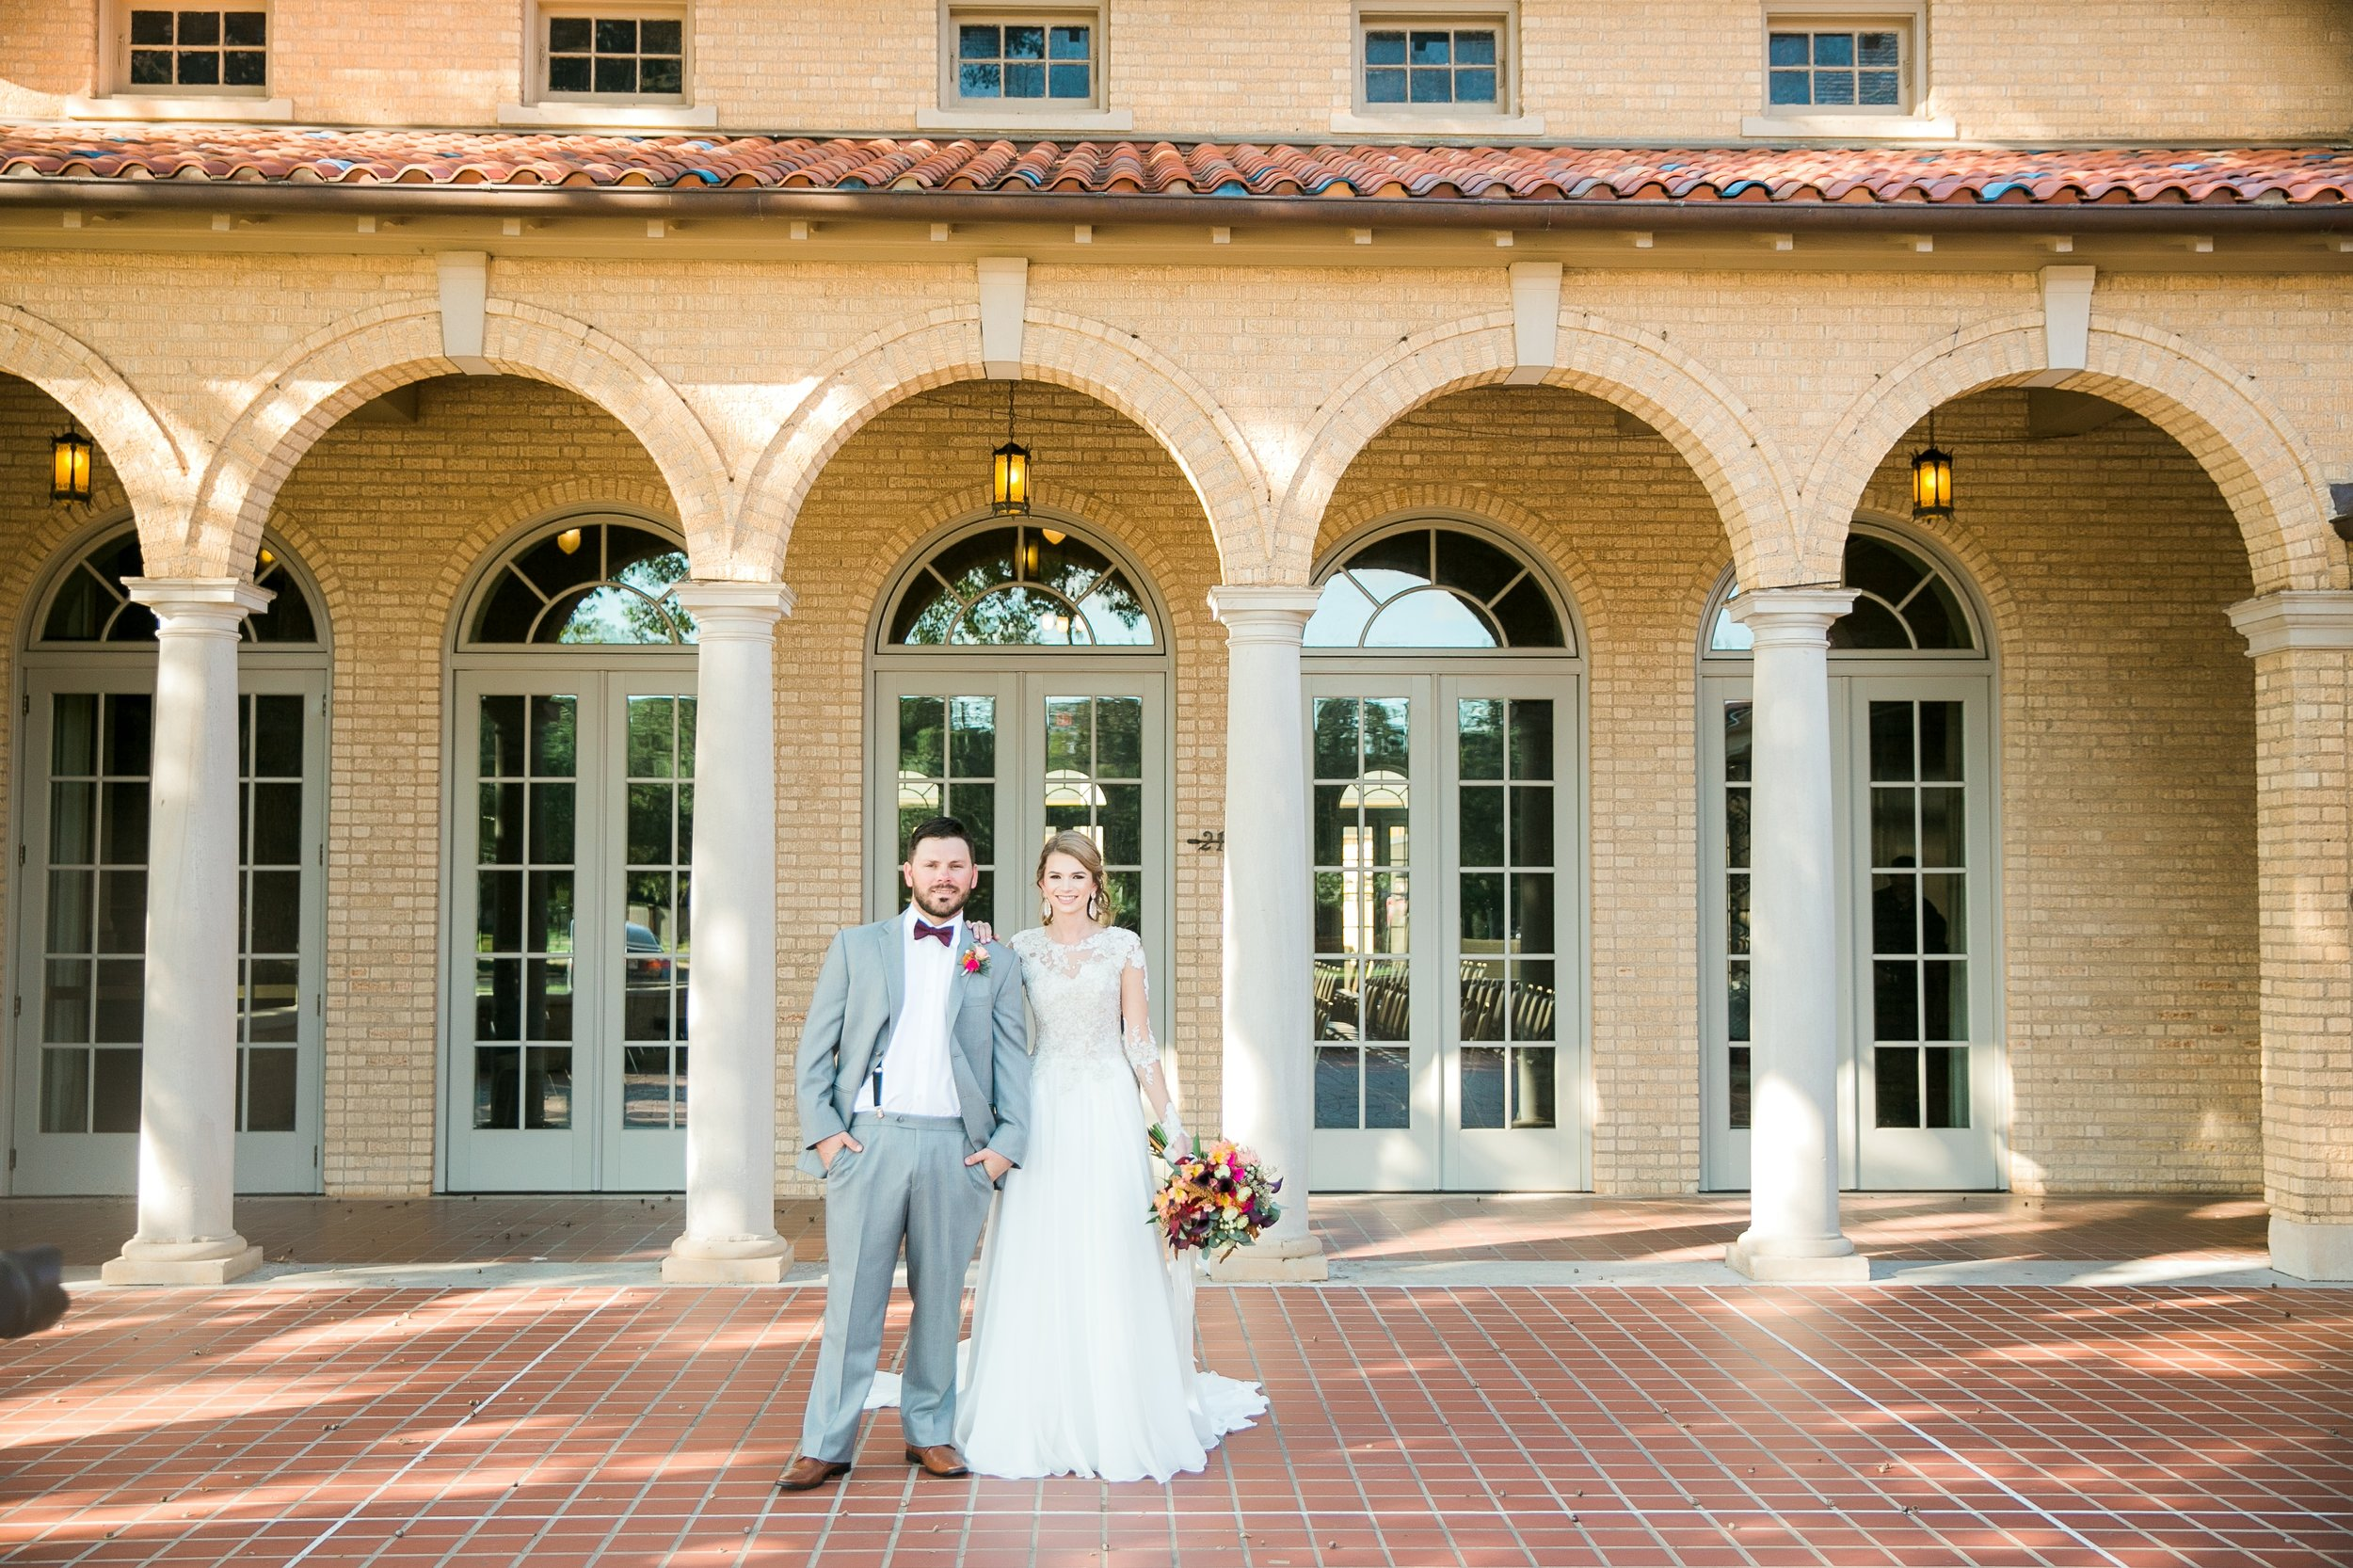 Roberson-Wedding-The-Forum-Lauren-Pinson-Wedding-Photography-Wichita-Falls-Texas-032.jpg